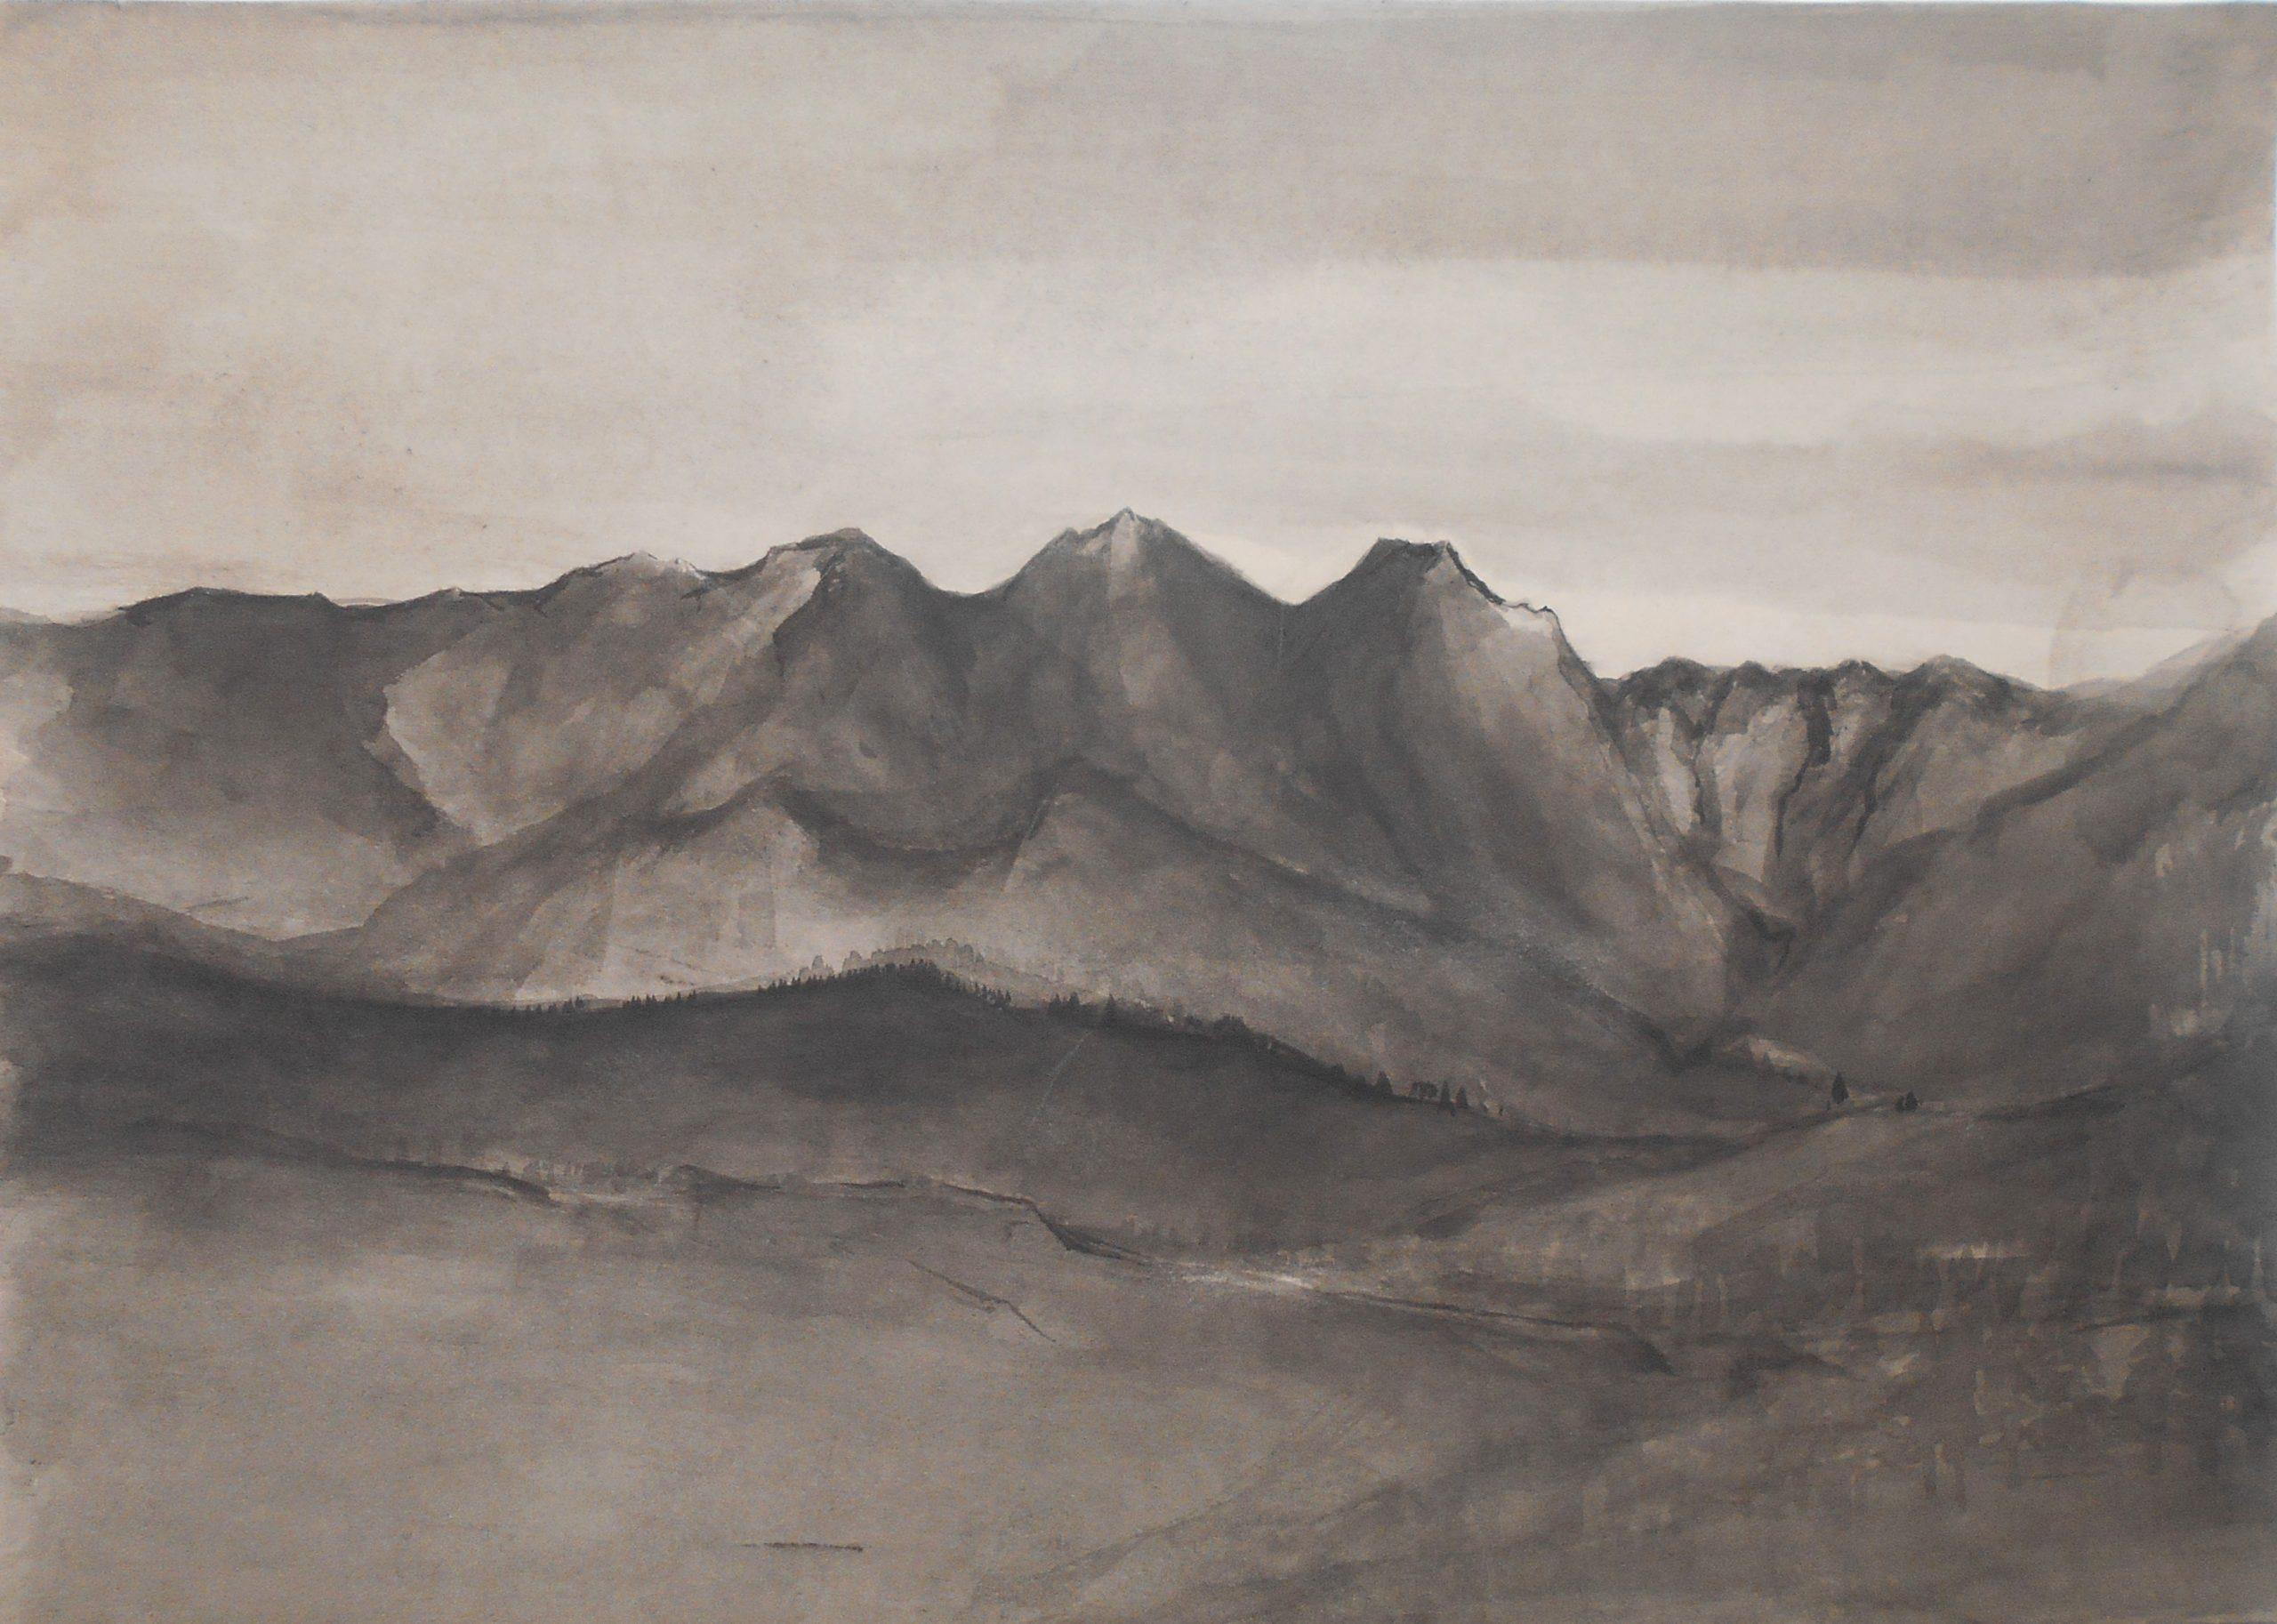 Sleepy mountains, 30x40cm, ink, paper, 2018